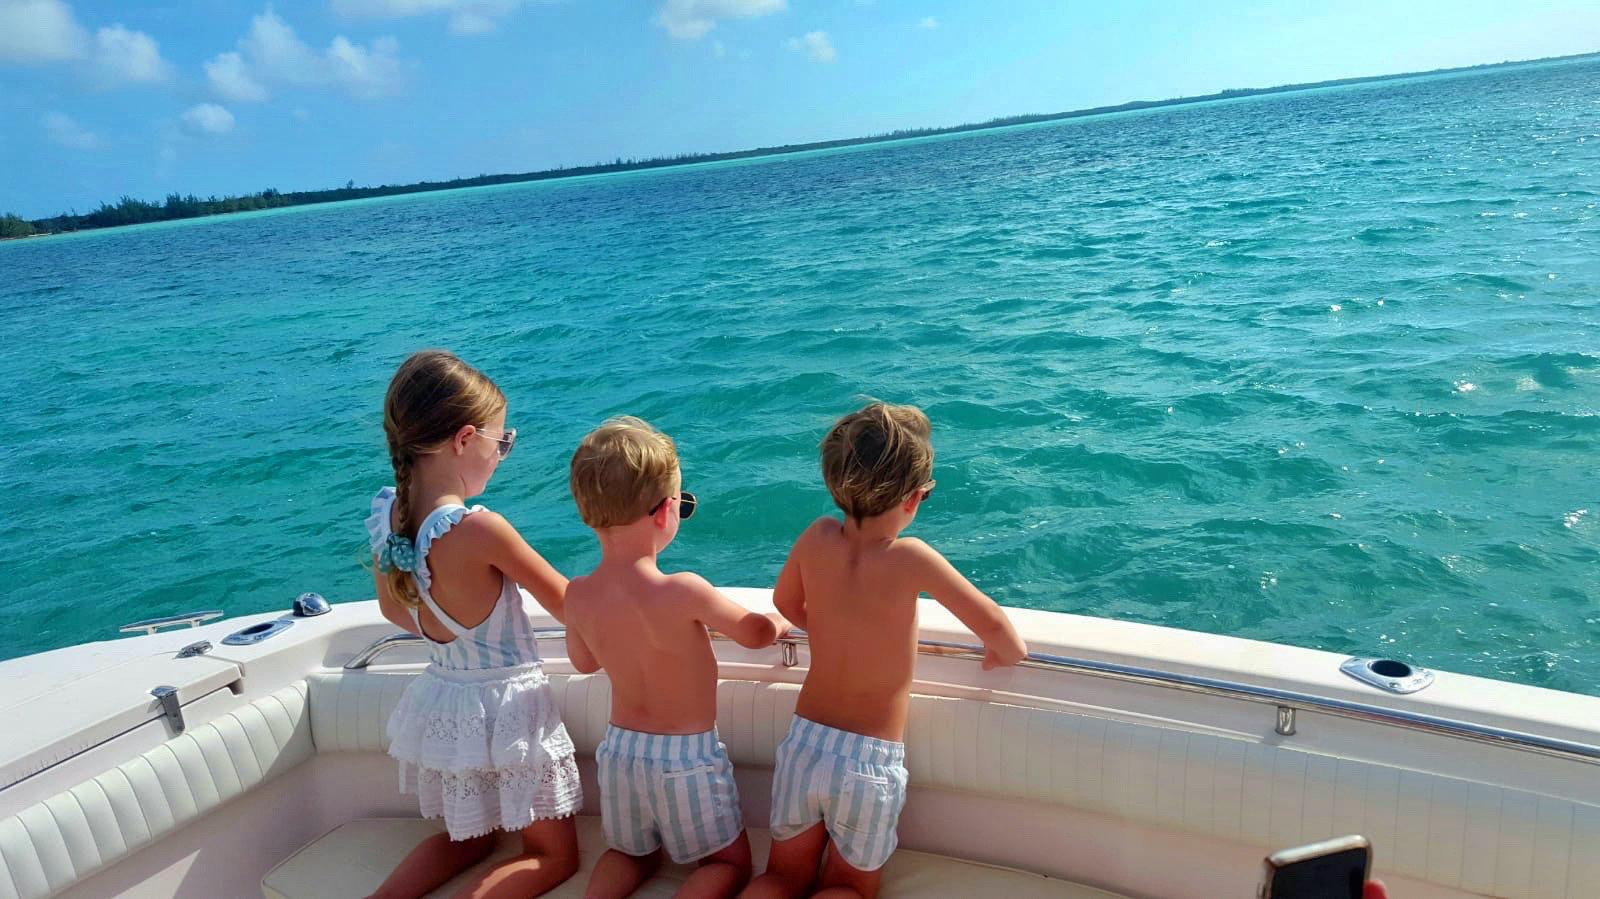 Boat Charter (Half Day)